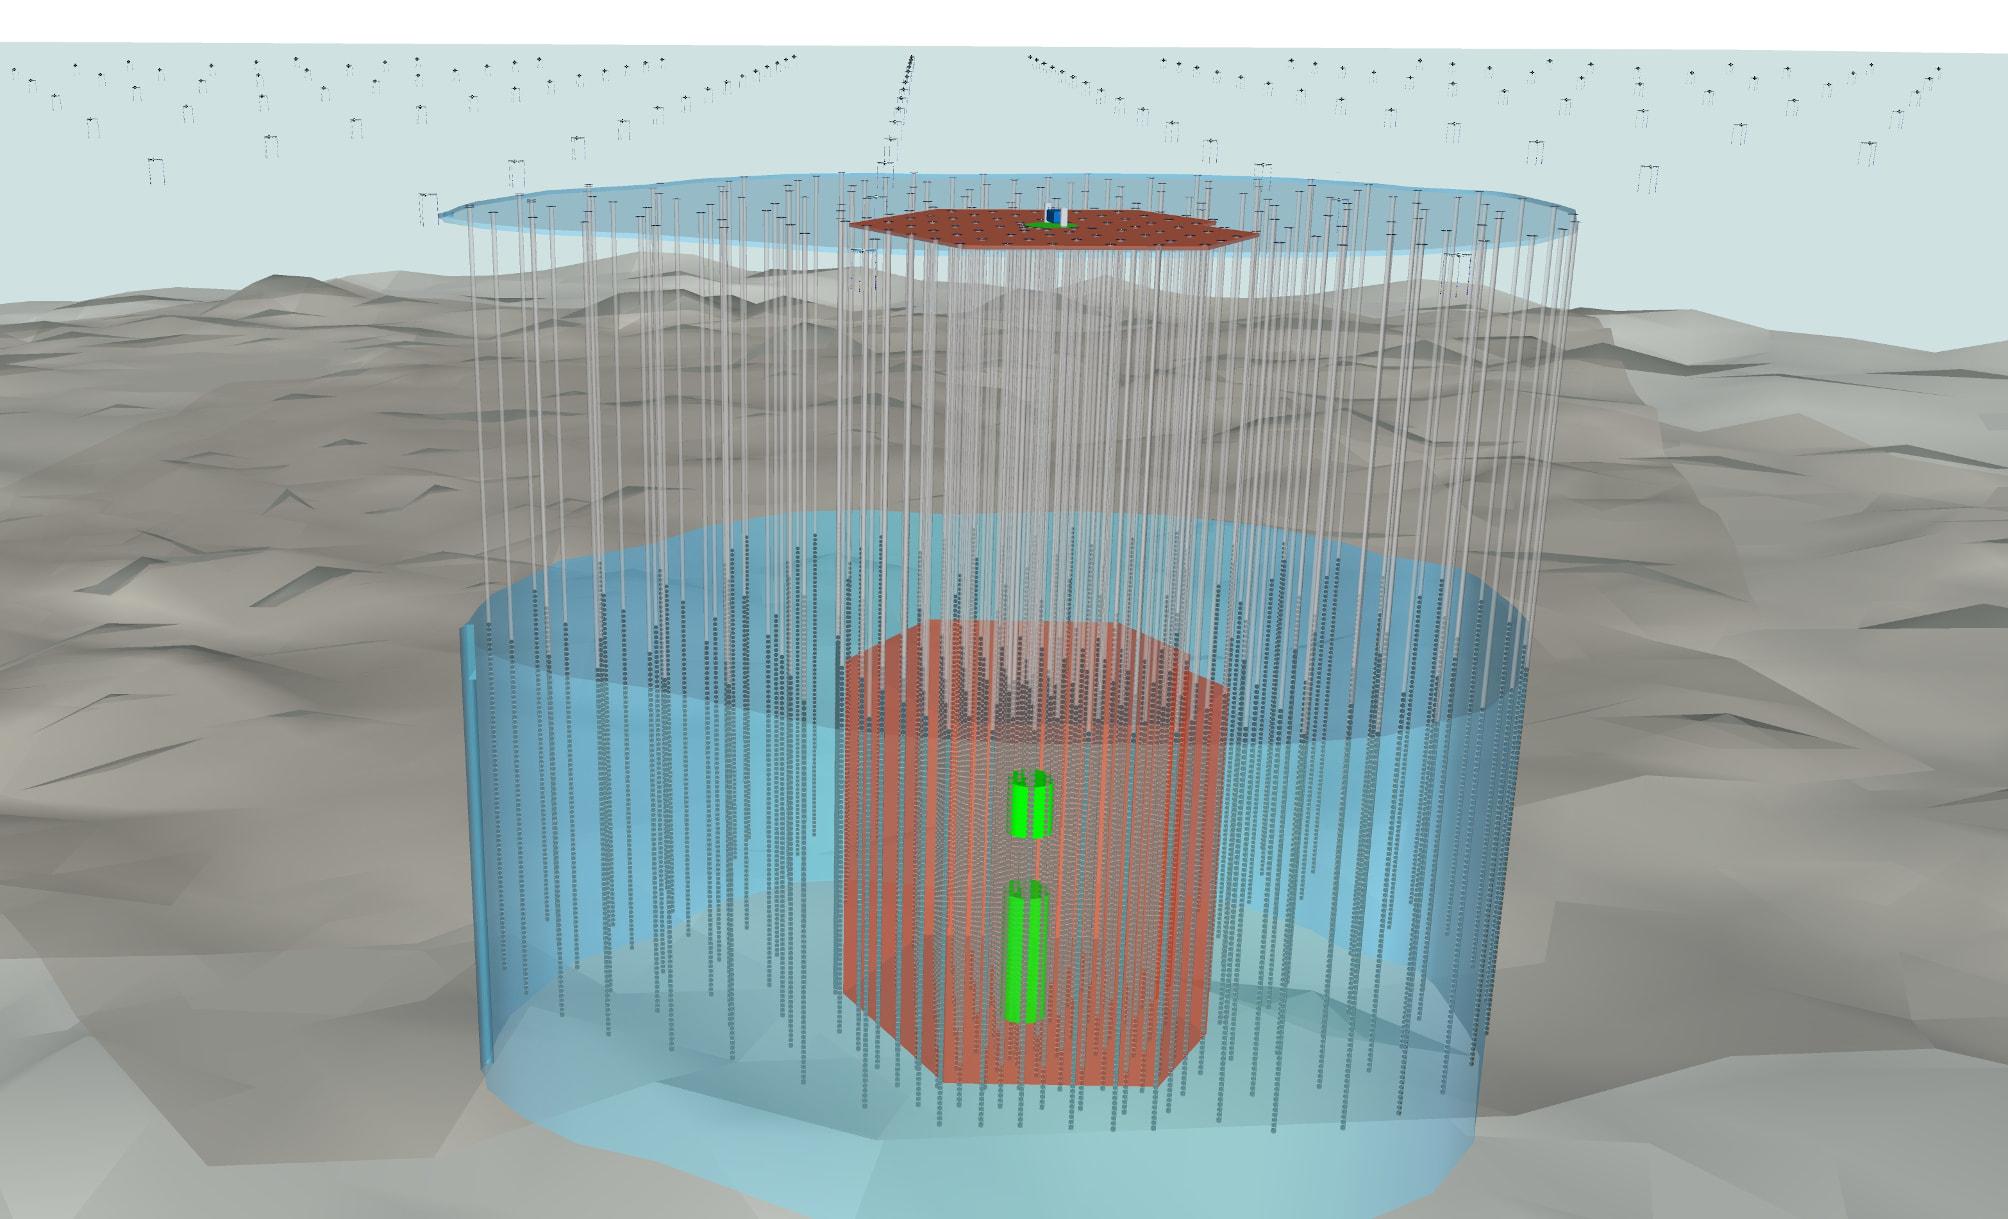 news_feat_icecube-gen2-will-open-new-window-on-universe